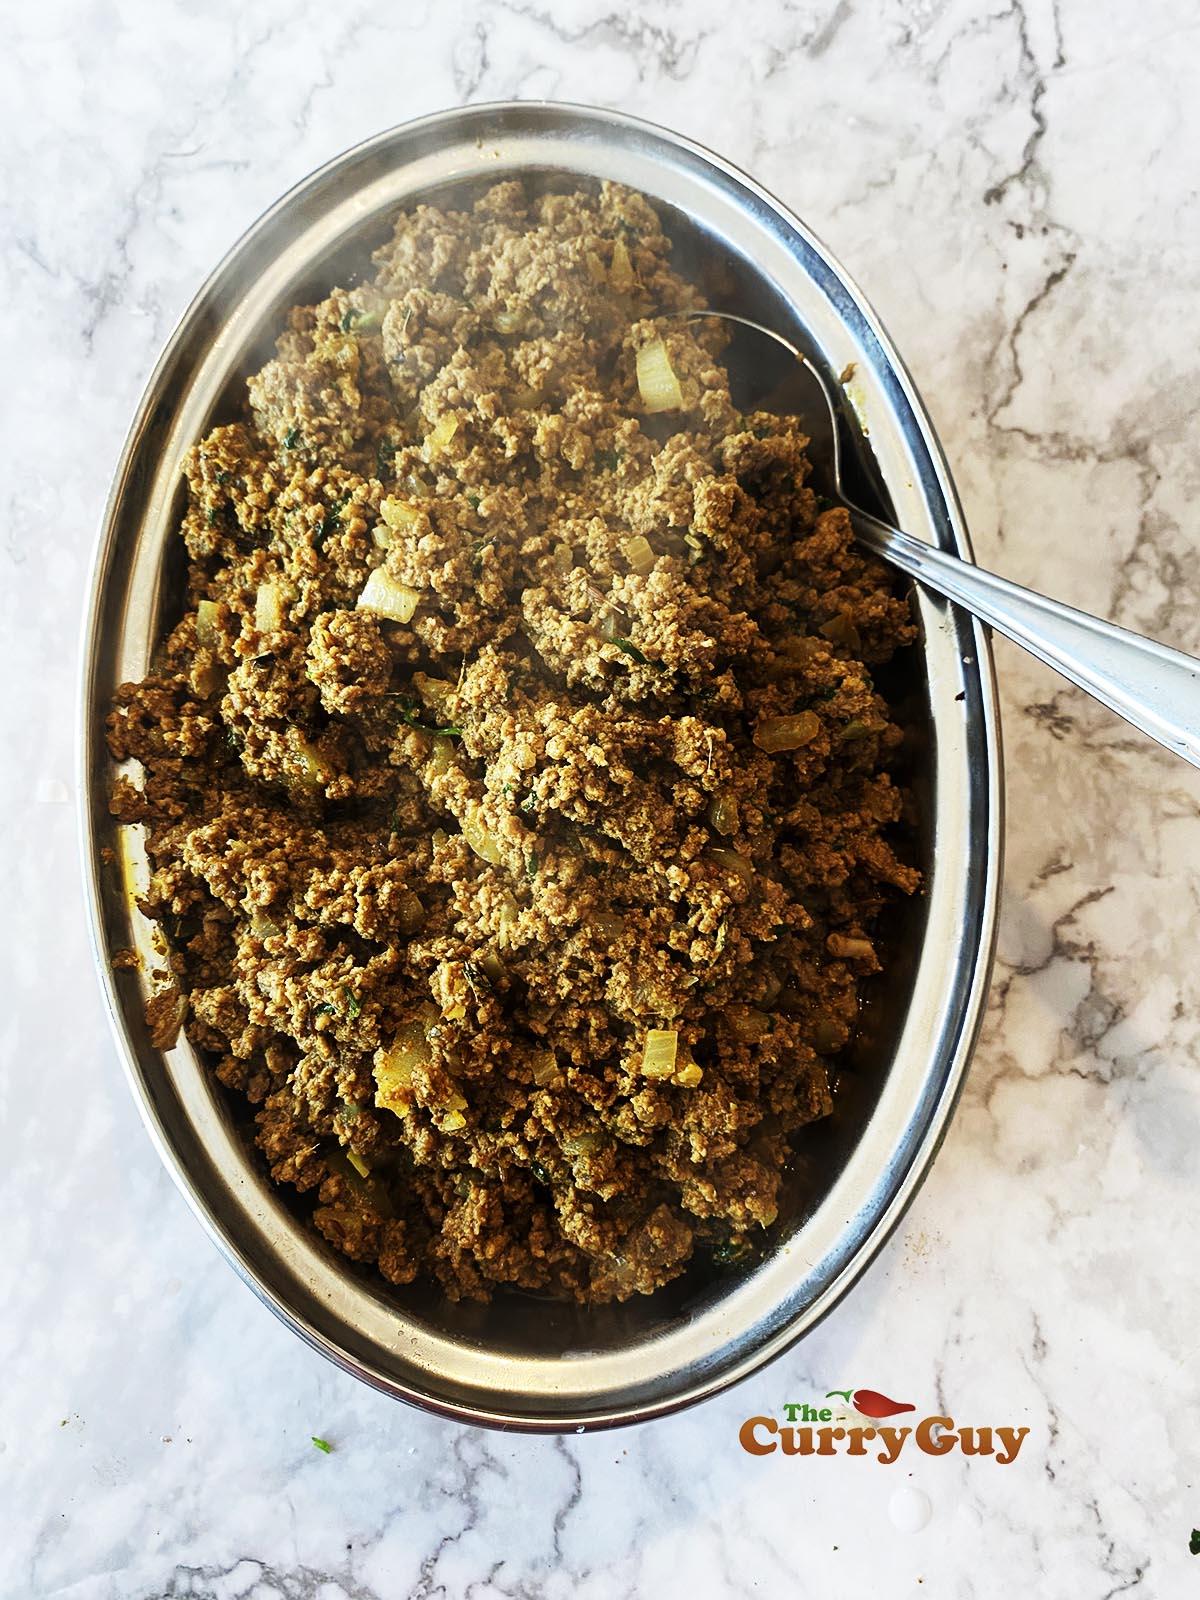 keema recipe made with beef